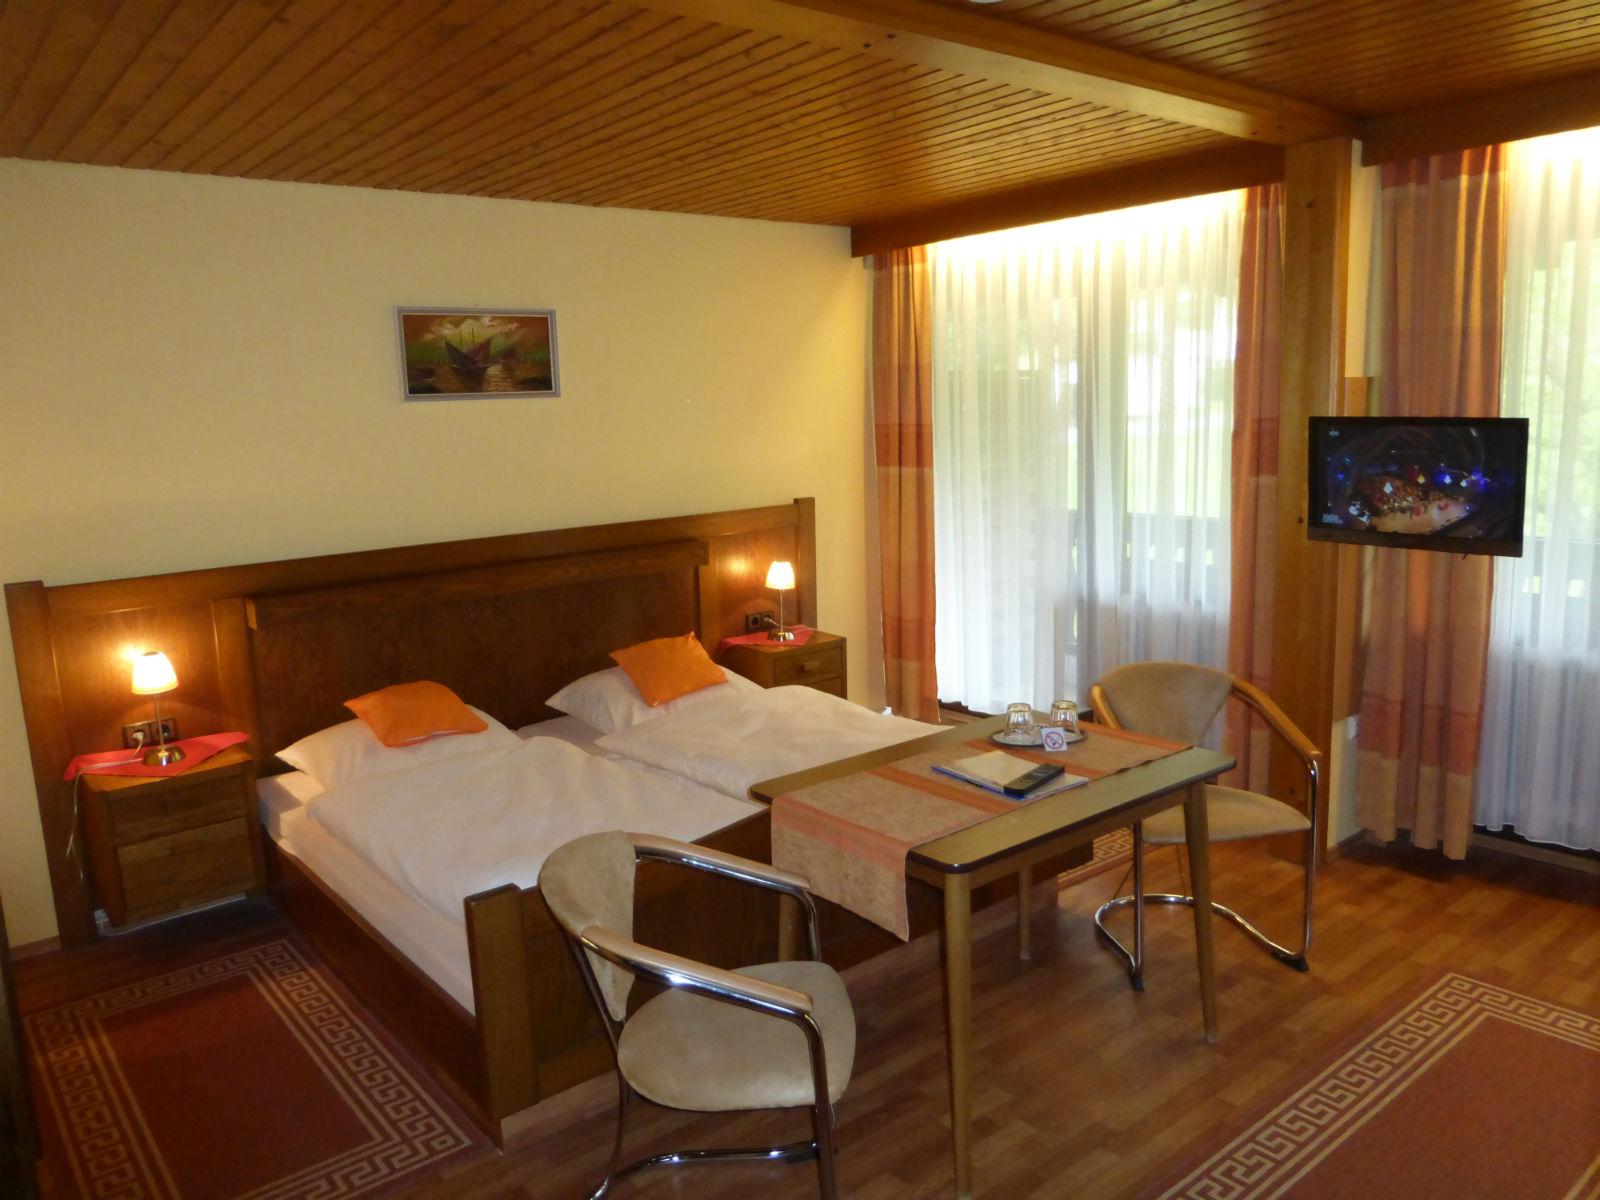 Hammerschmiede-Zimmer-Schlafzimmer